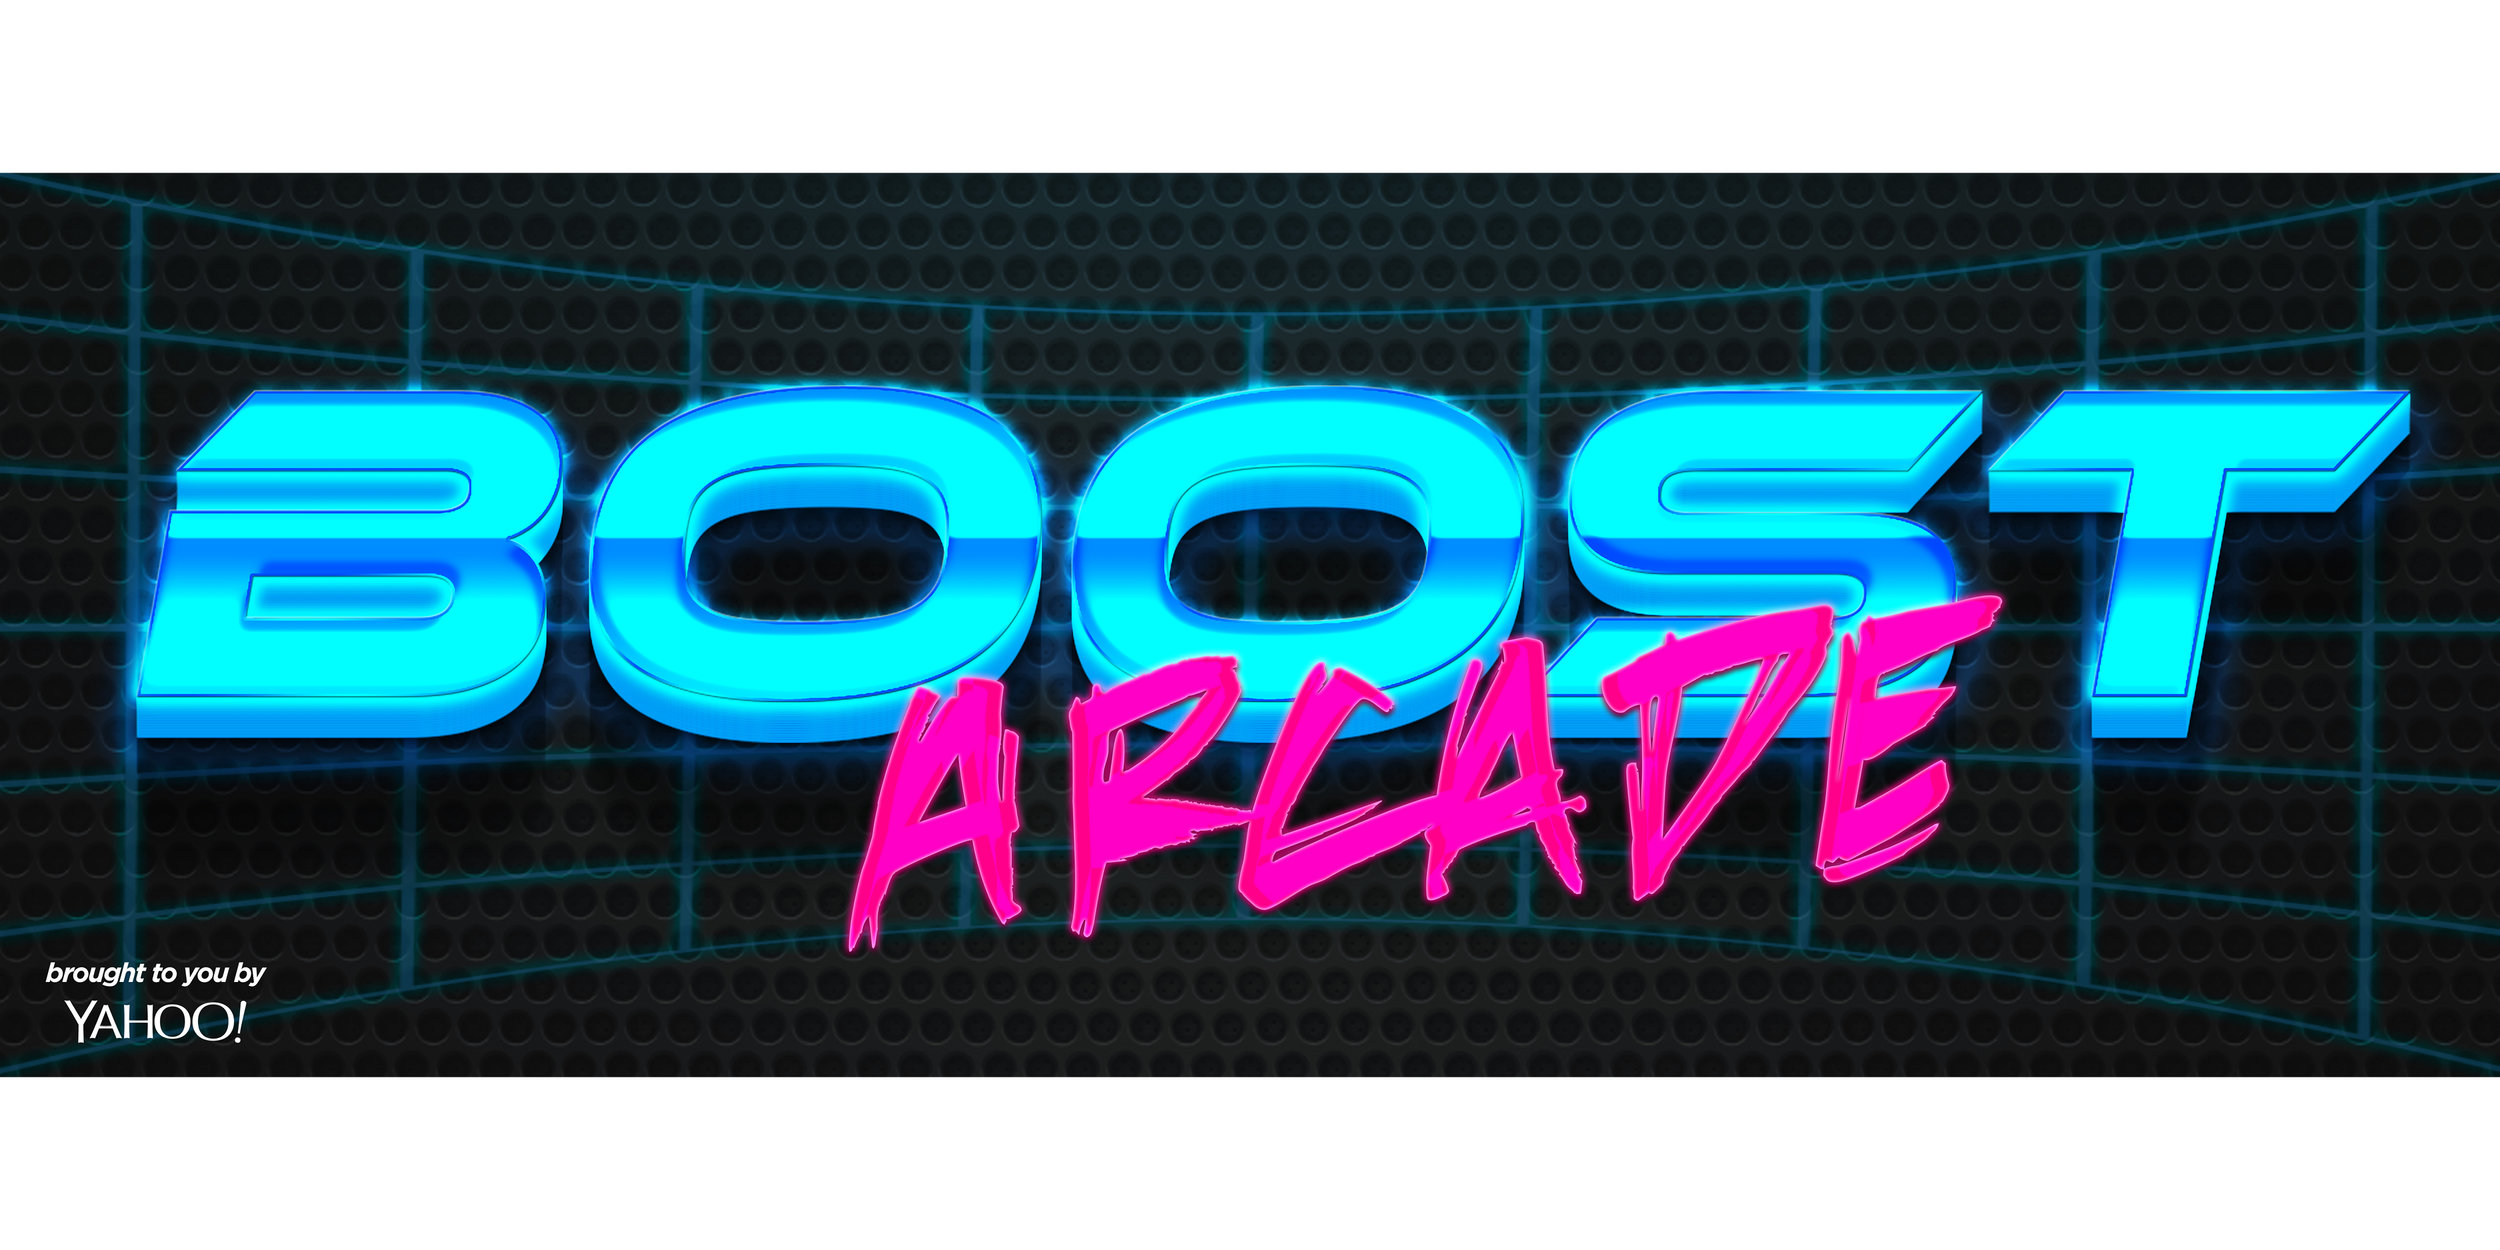 Arcade Comps35.jpg